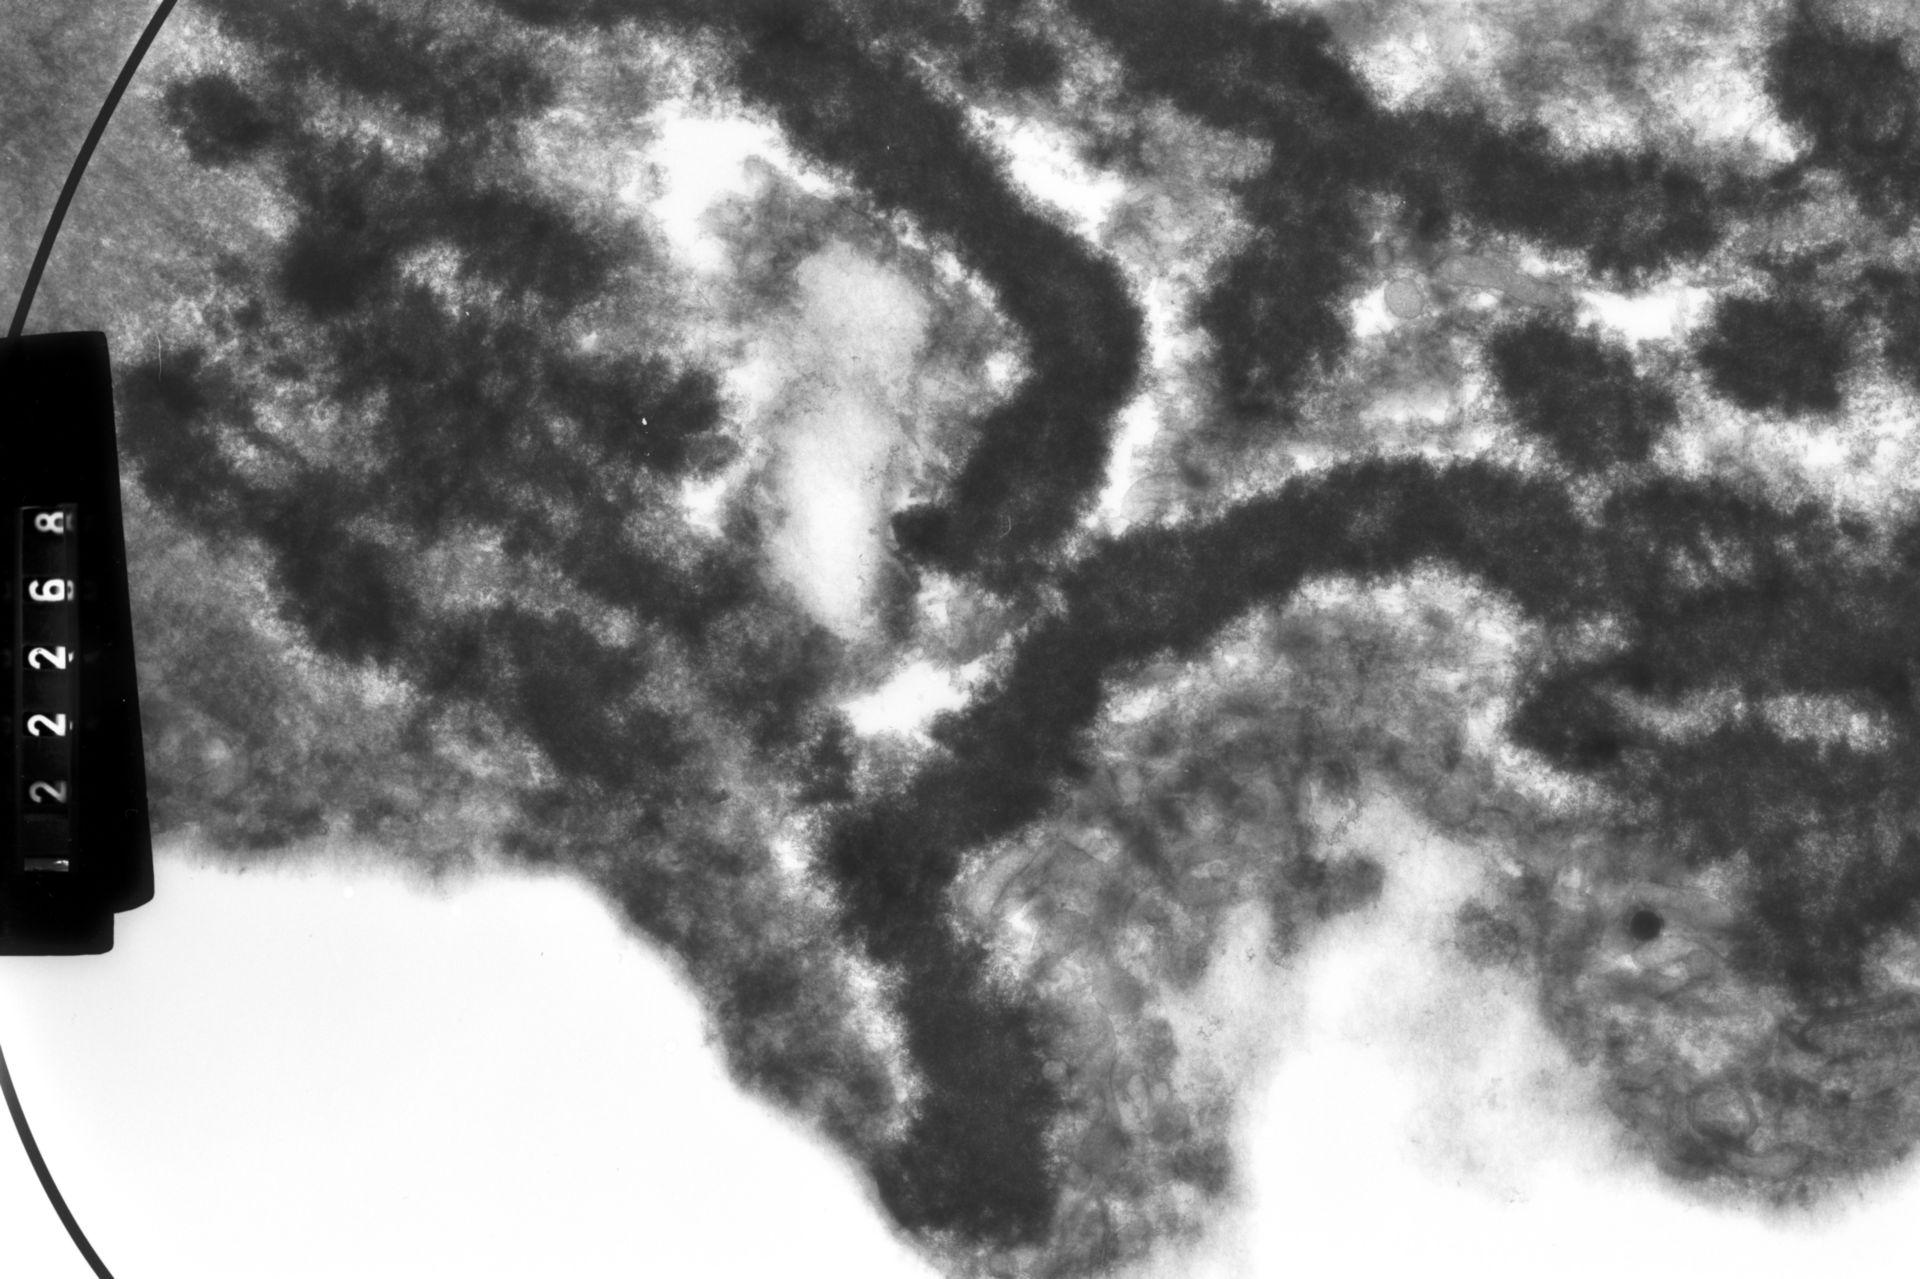 Haemanthus katharinae (Nuclear chromosome) - CIL:13191